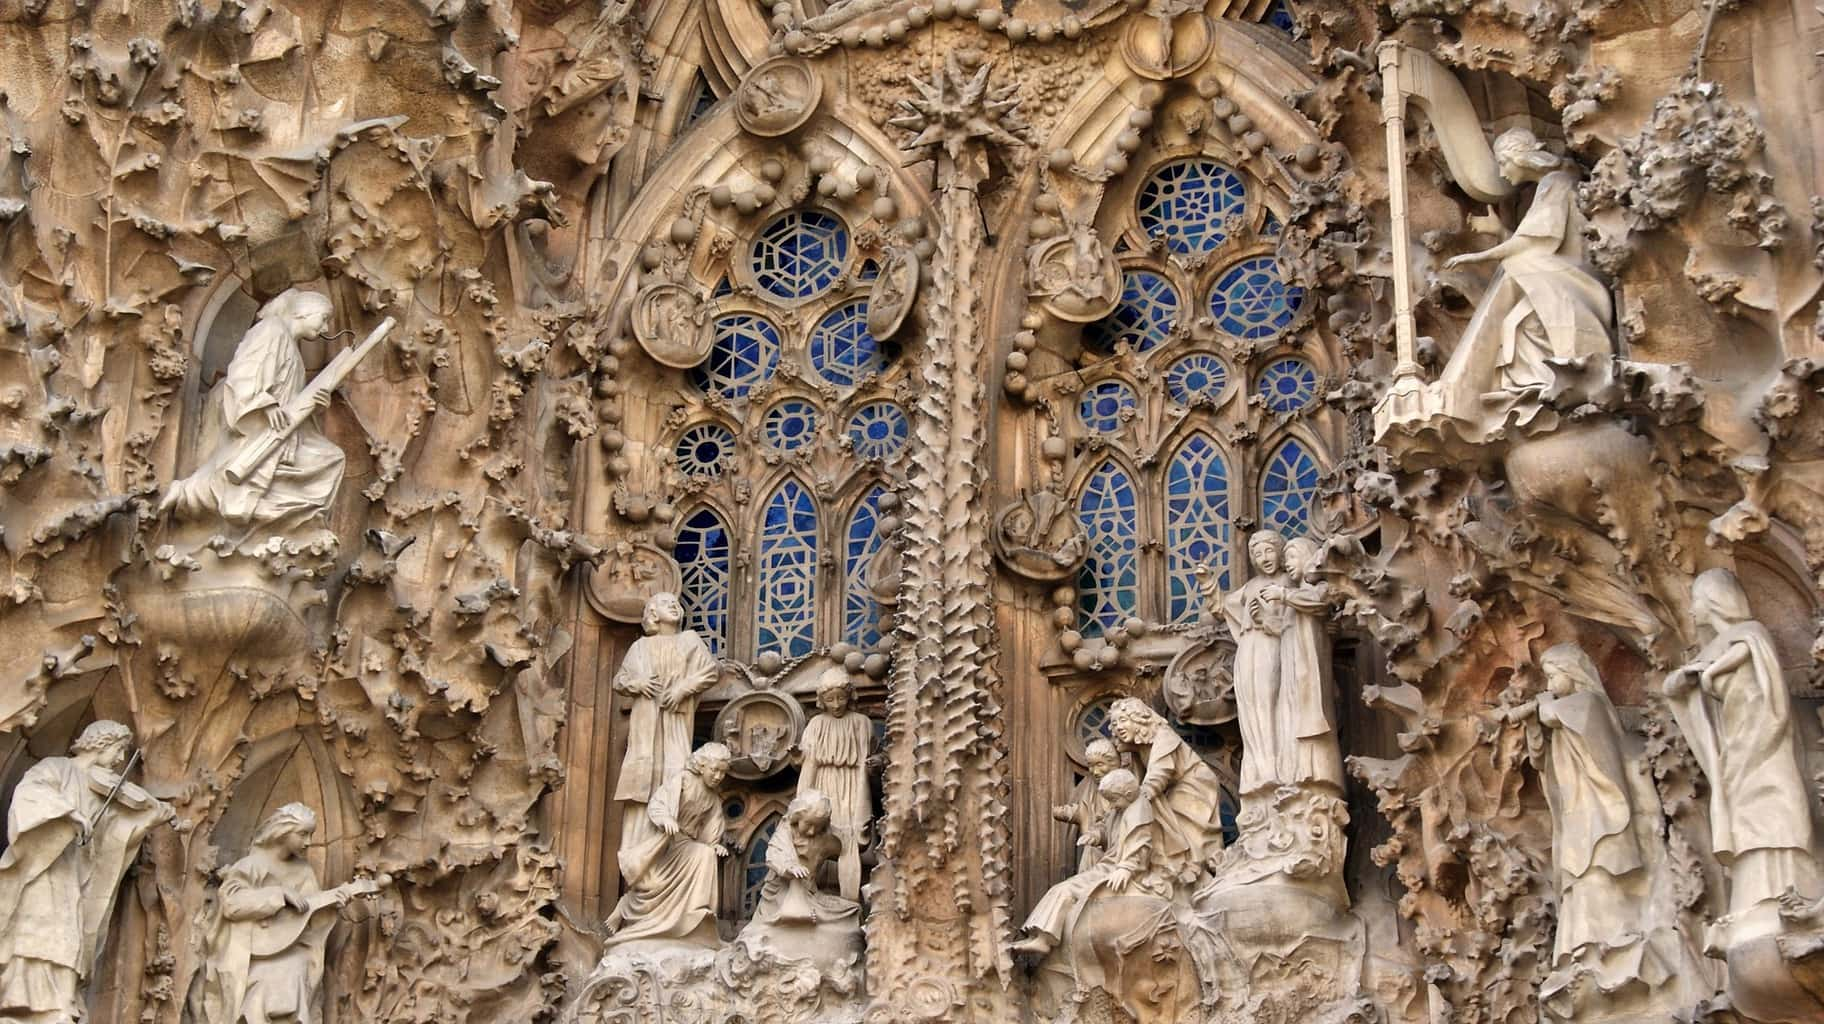 Passion facade at Sagrada Familia